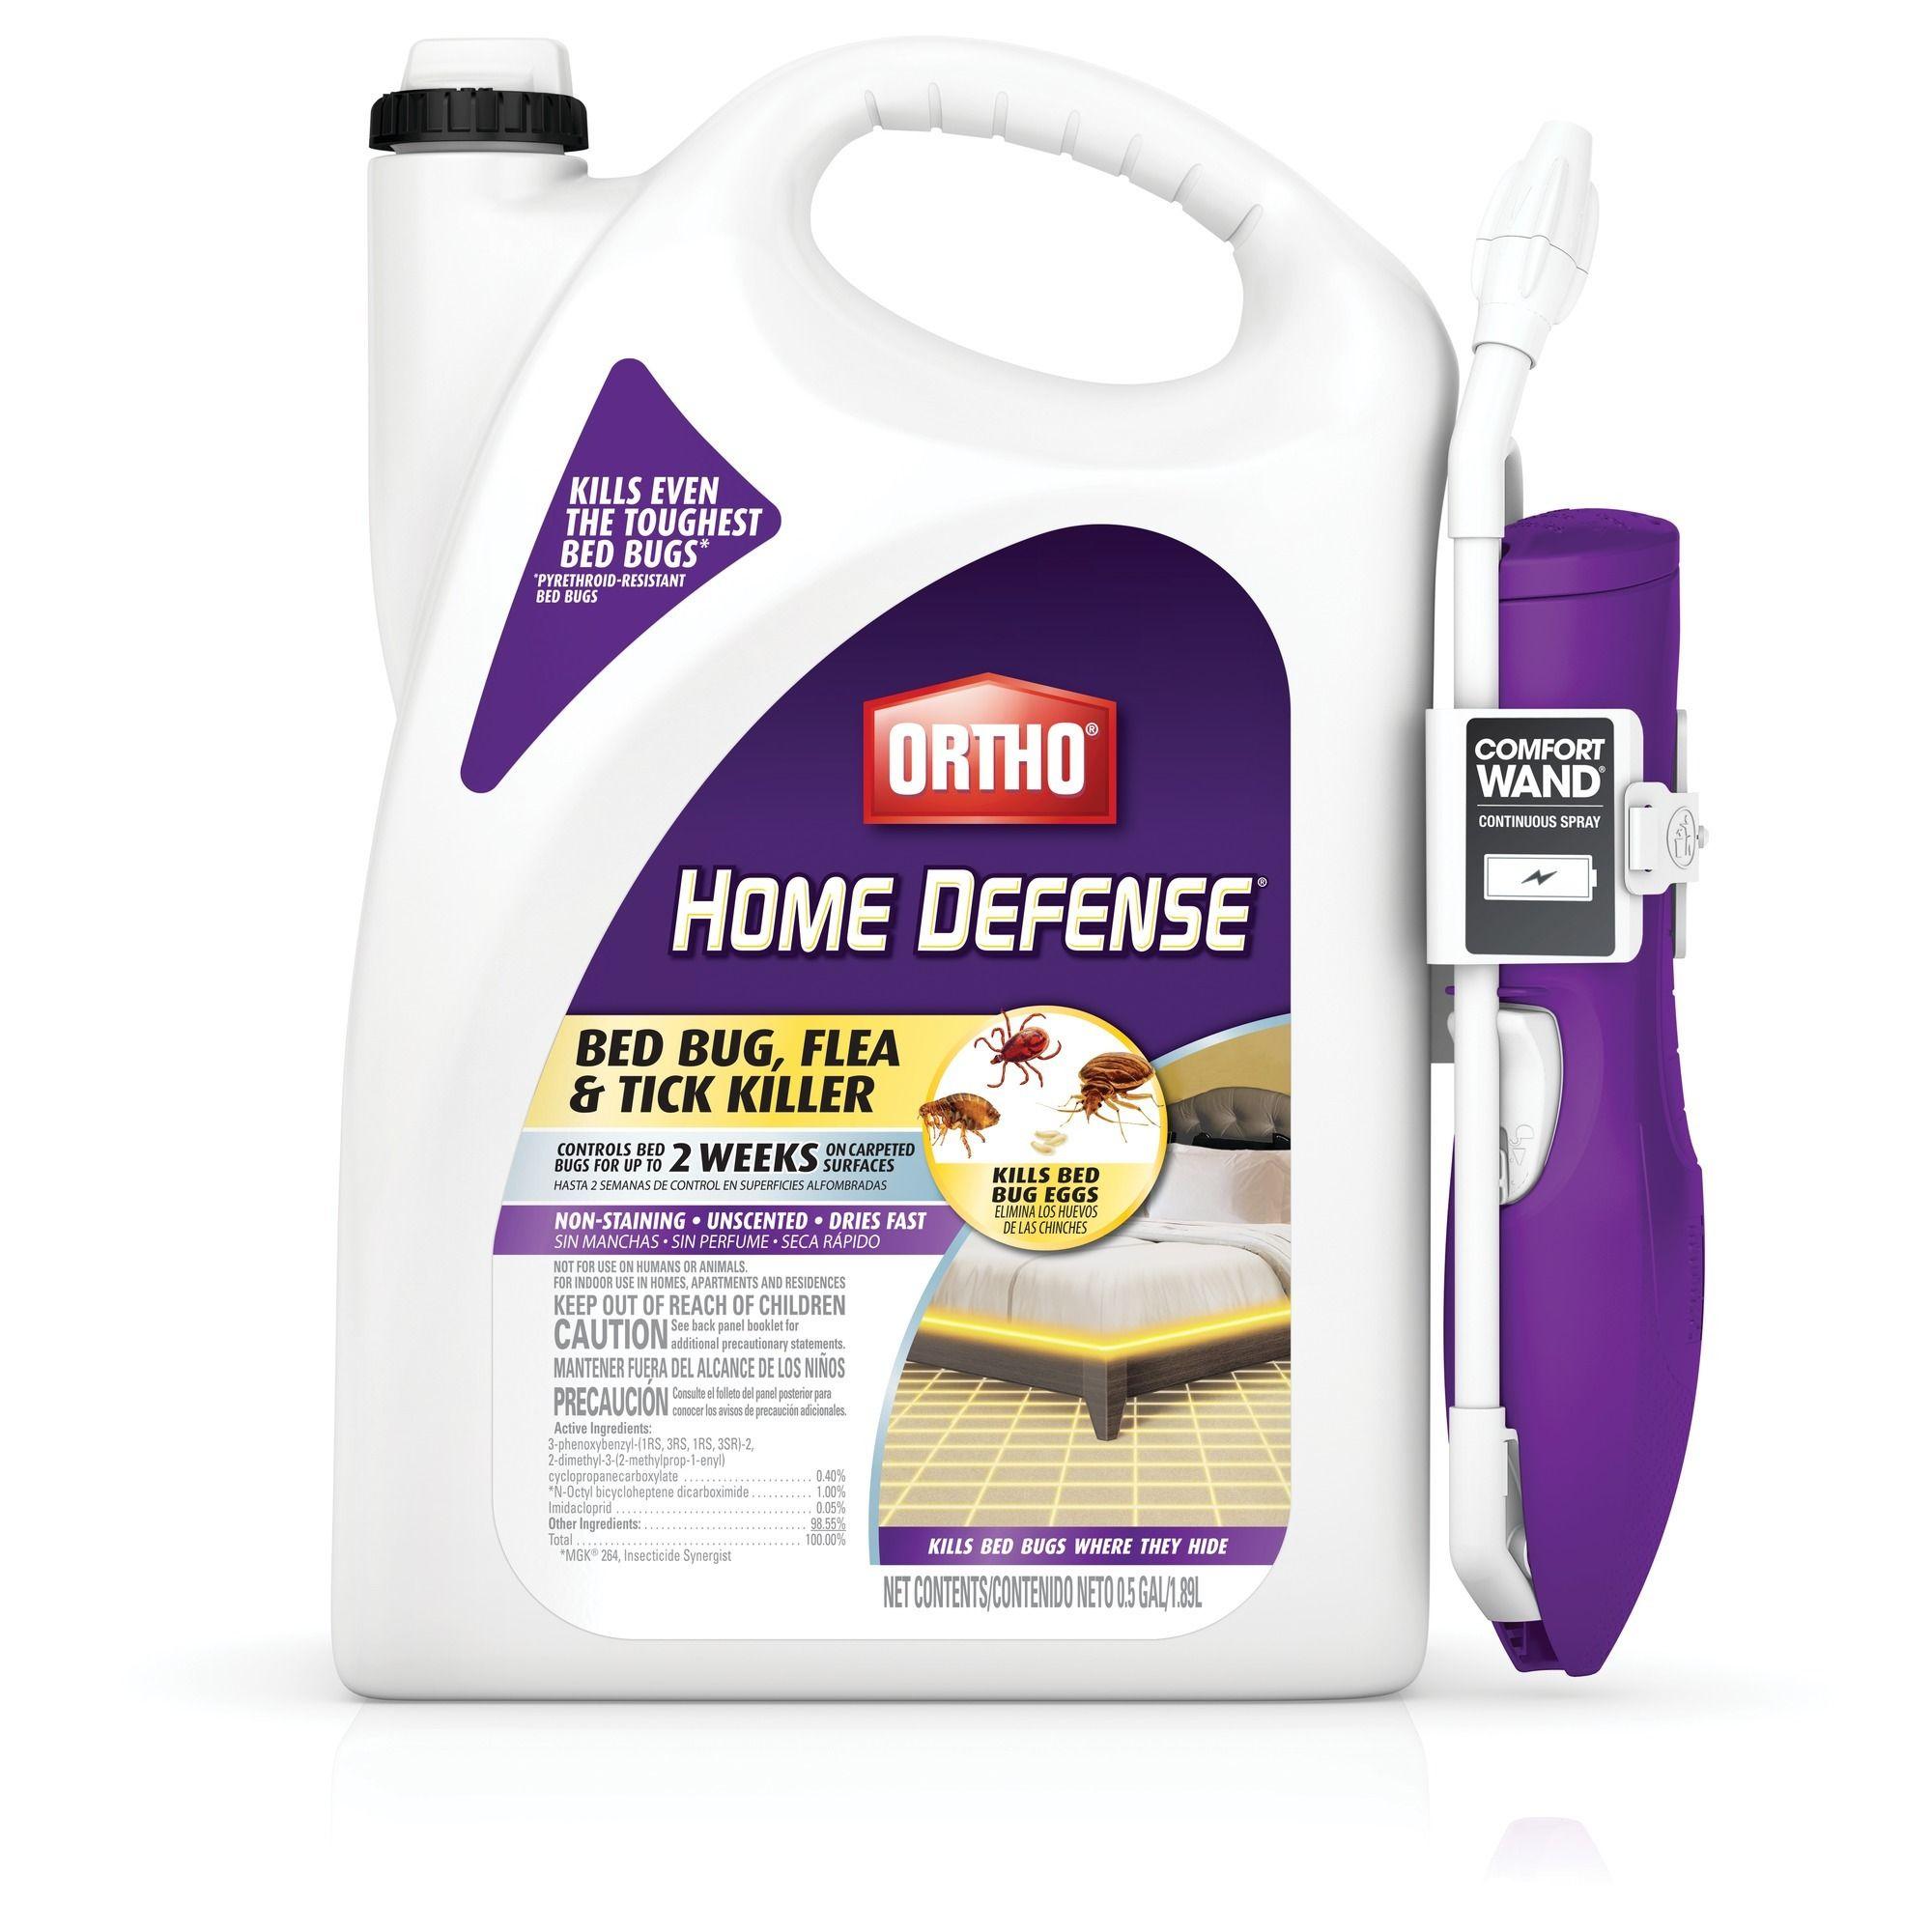 Ortho-Home-Defense-Bed-Bug-Flea-and-Tick-Killer